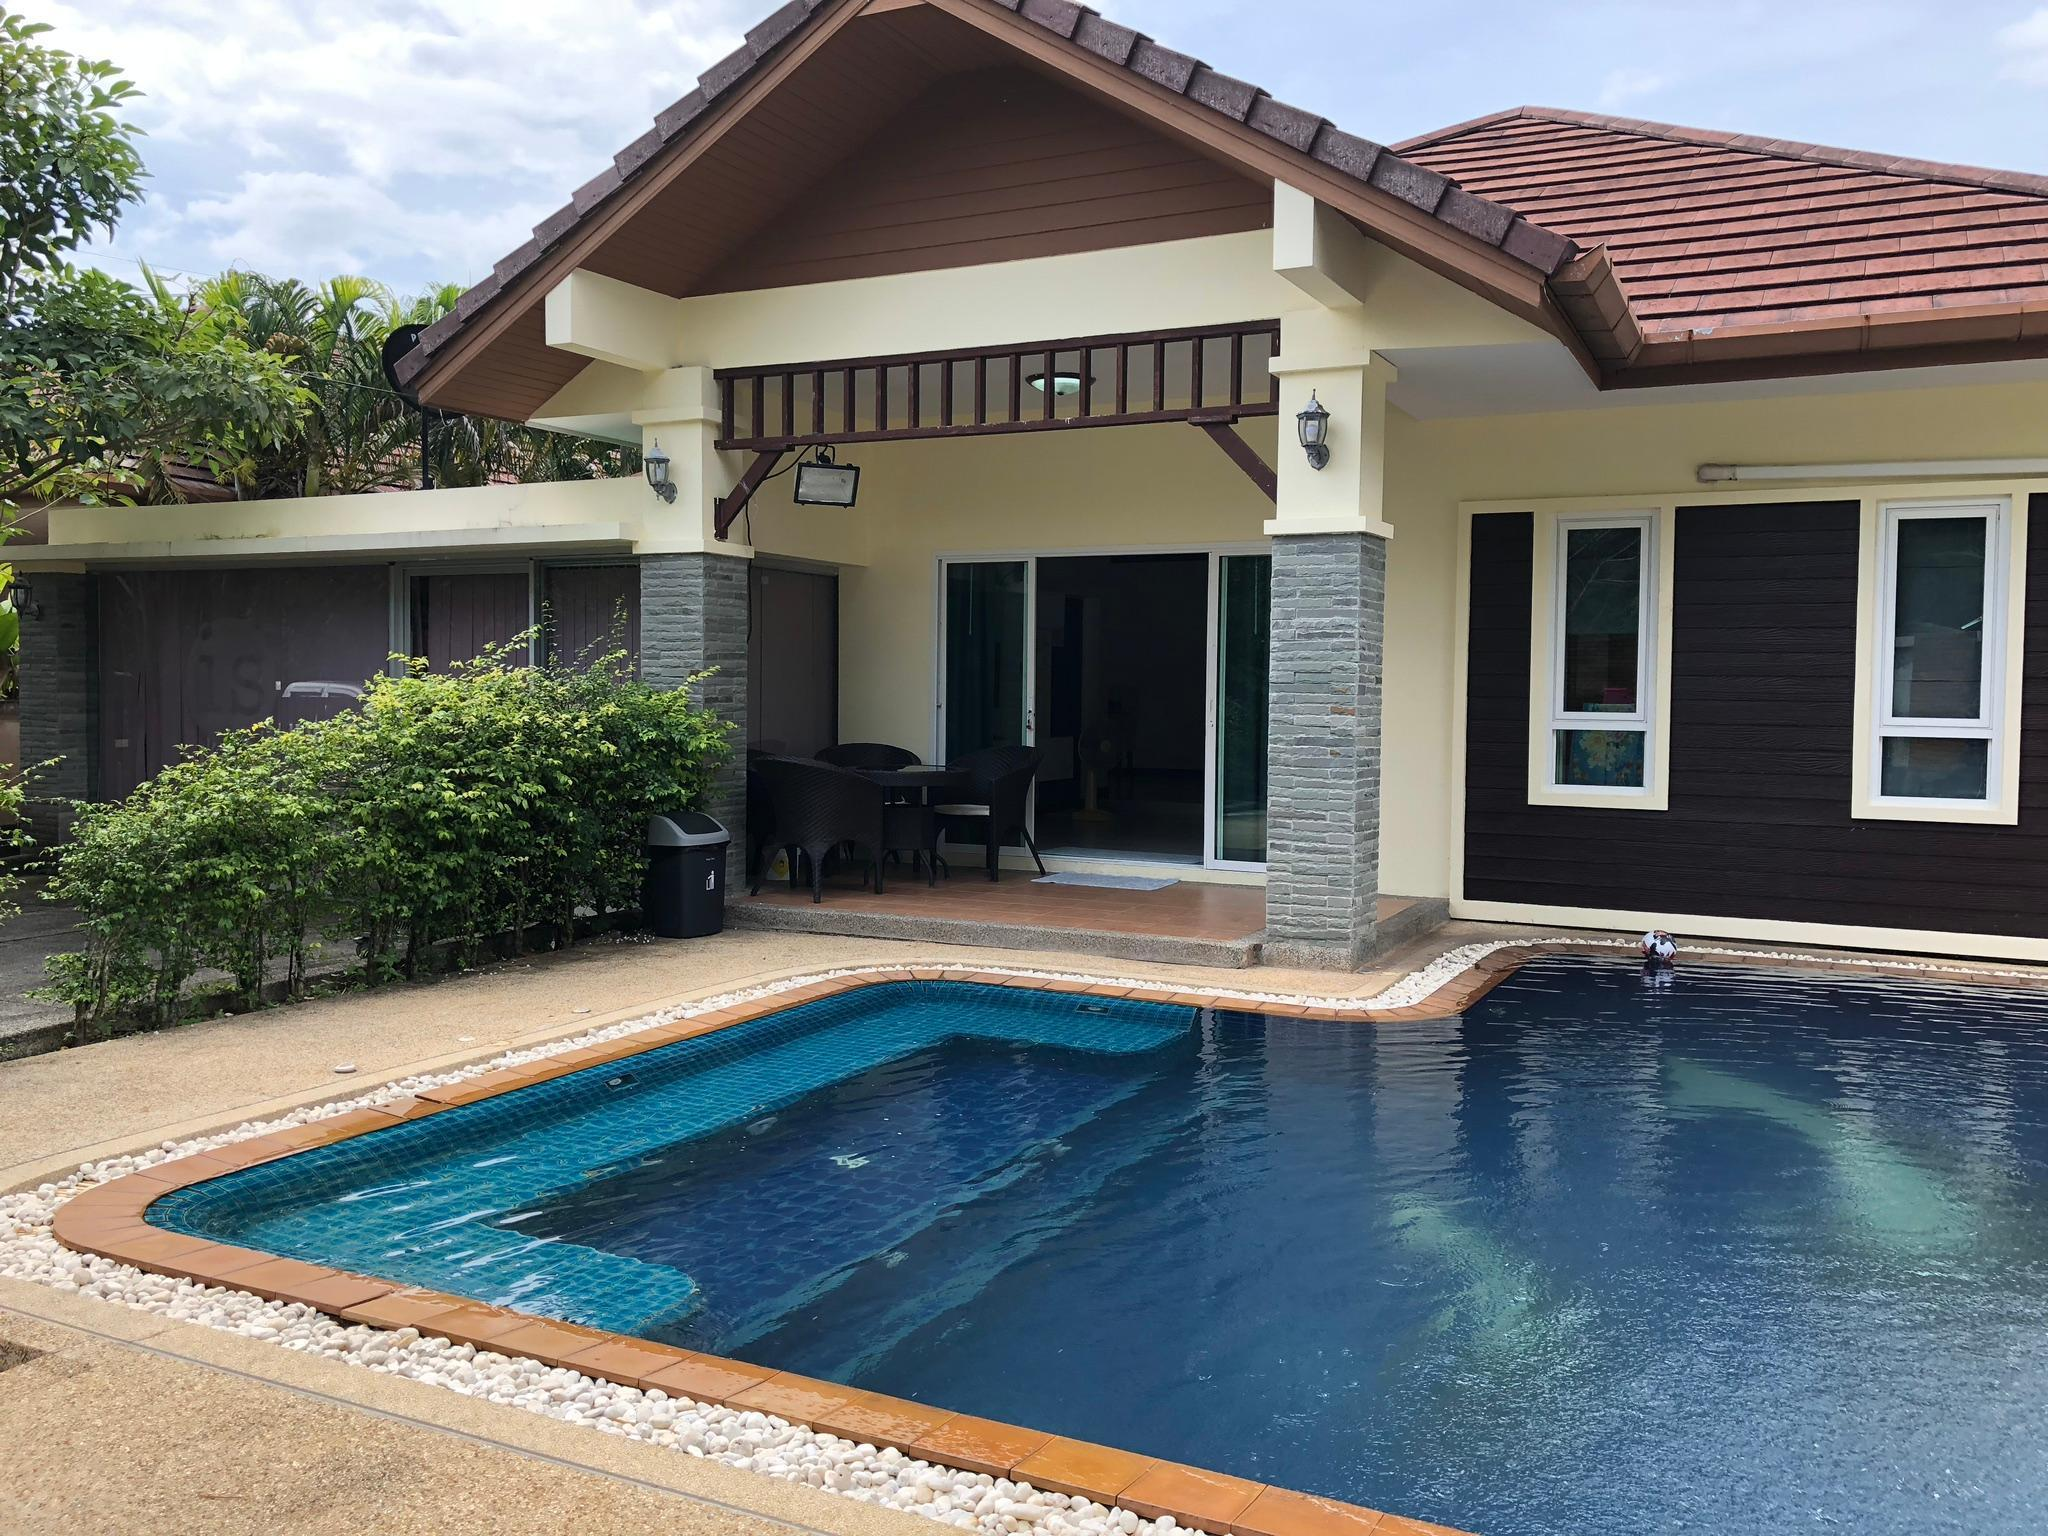 Pool Villa Kathu Phuket พูล วิลล่า กะทู้ ภูเก็ต